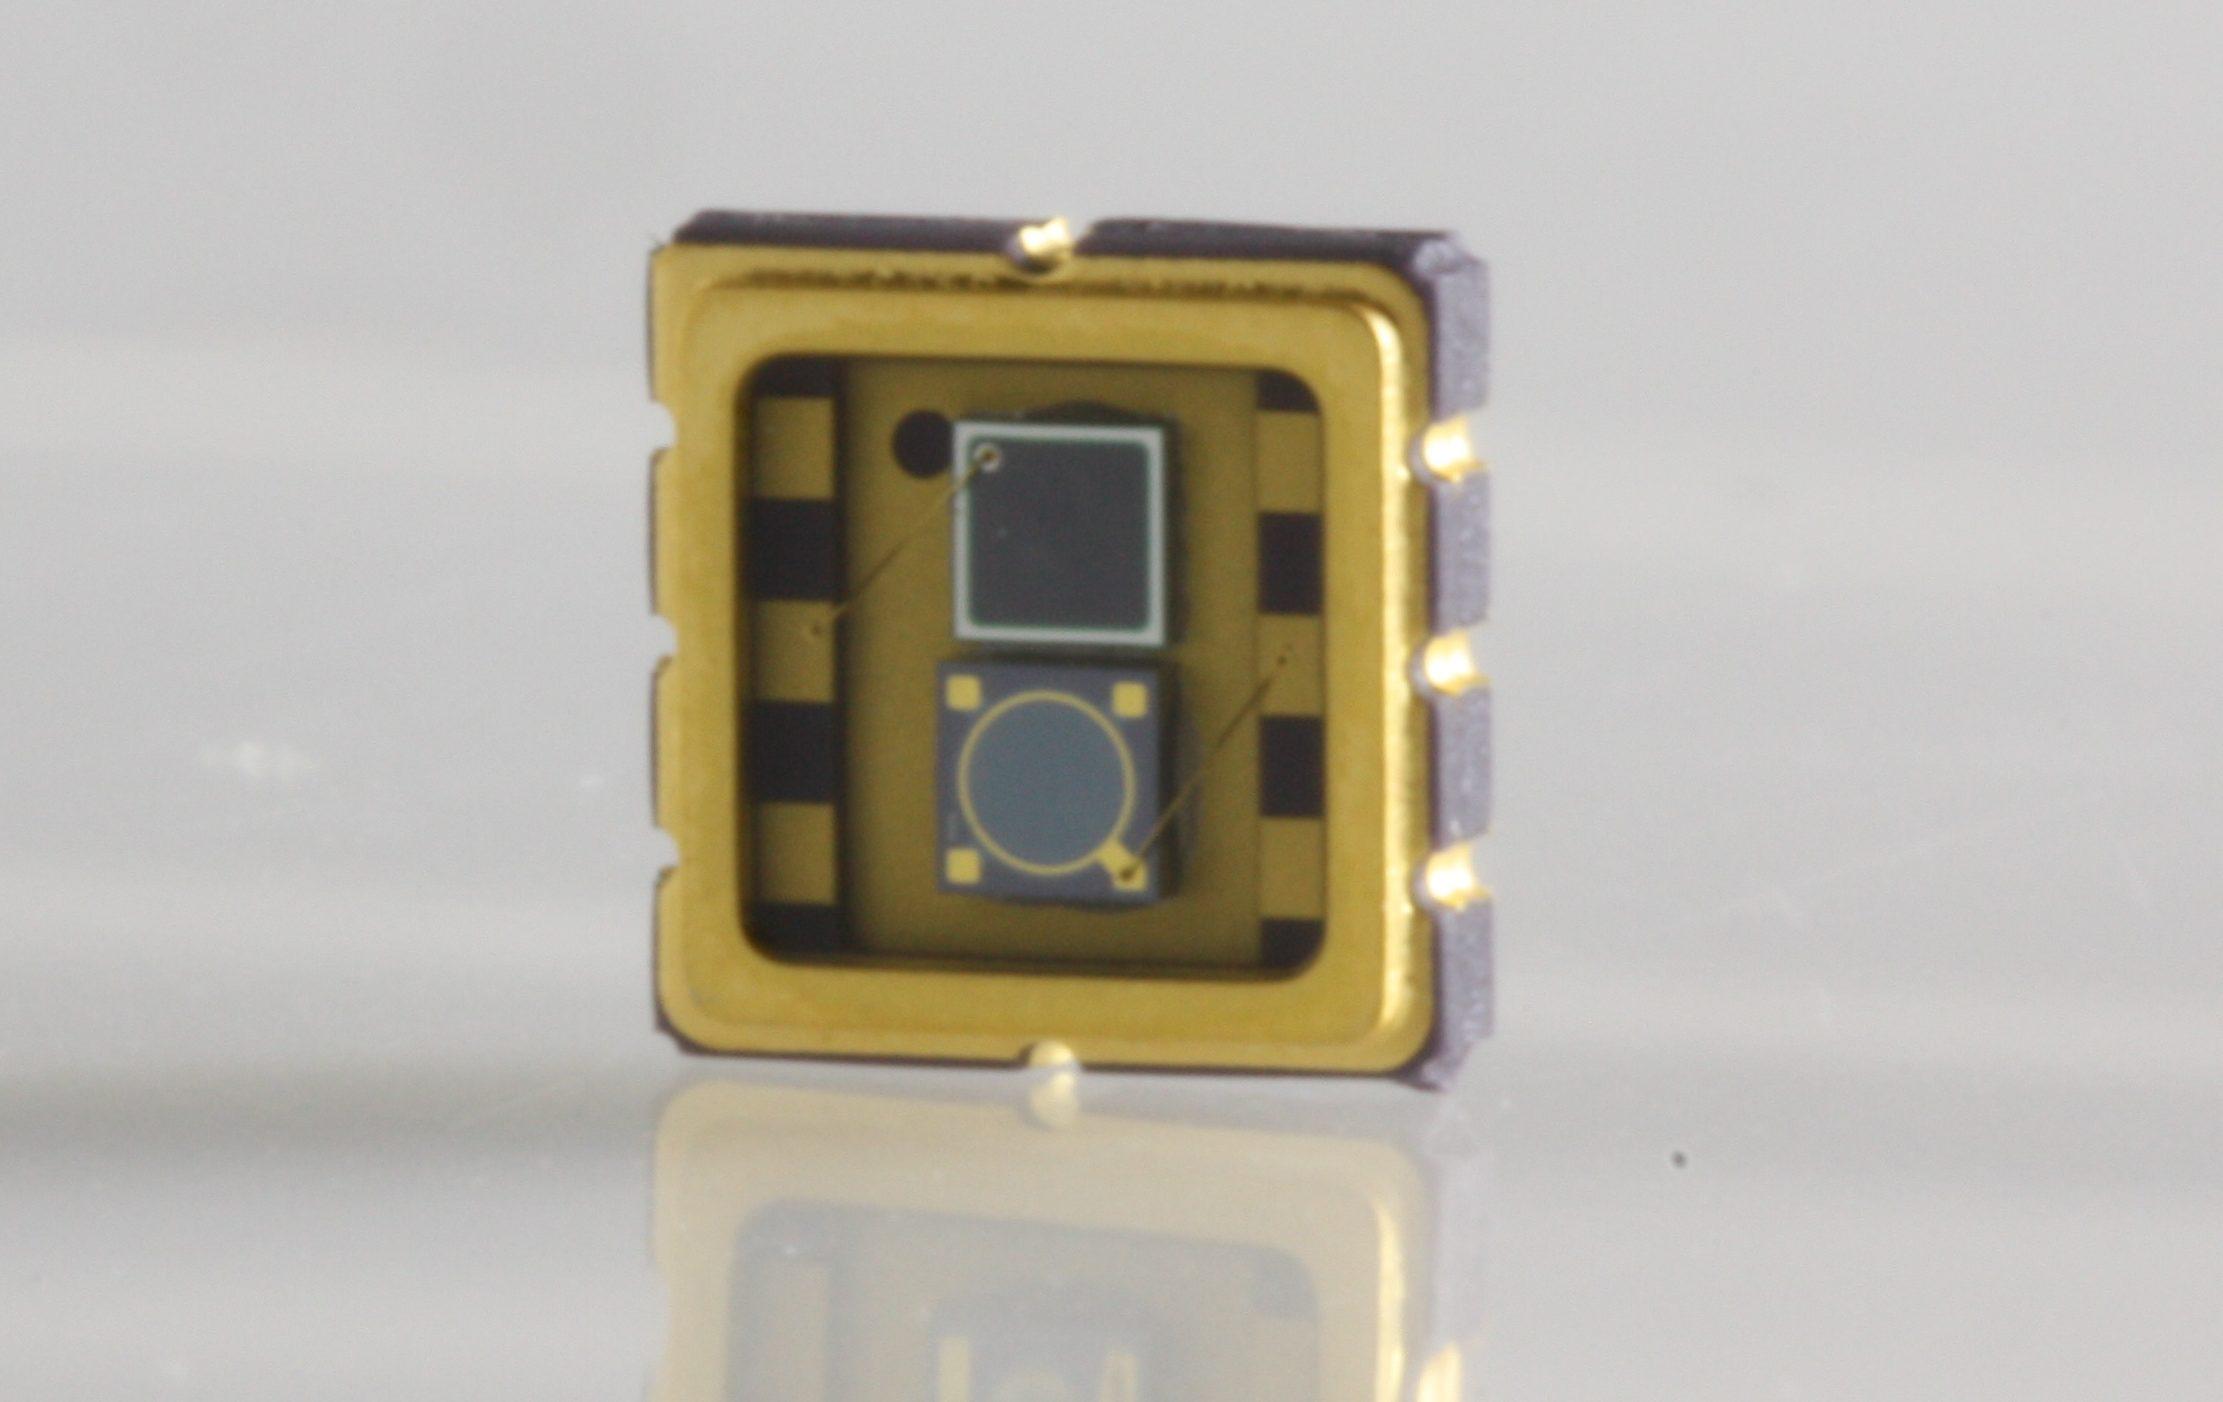 New Broadband Hybrid Silicon-InGaAs Photodetectors